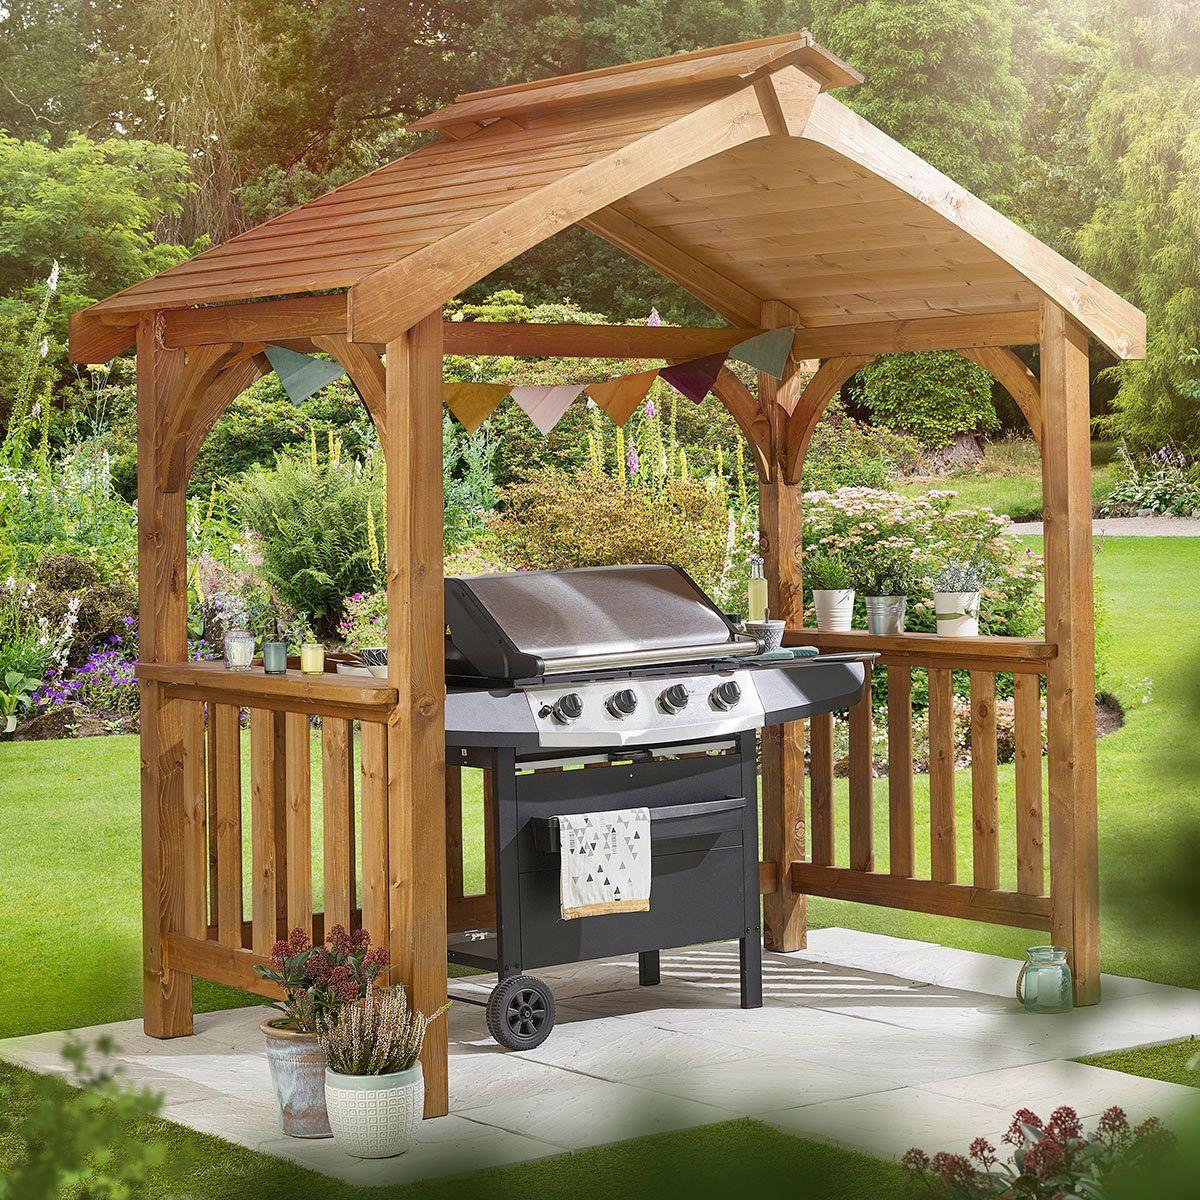 Anchor Fast Pine Wood Bbq Grilling Pavilion Bbq Gazebo